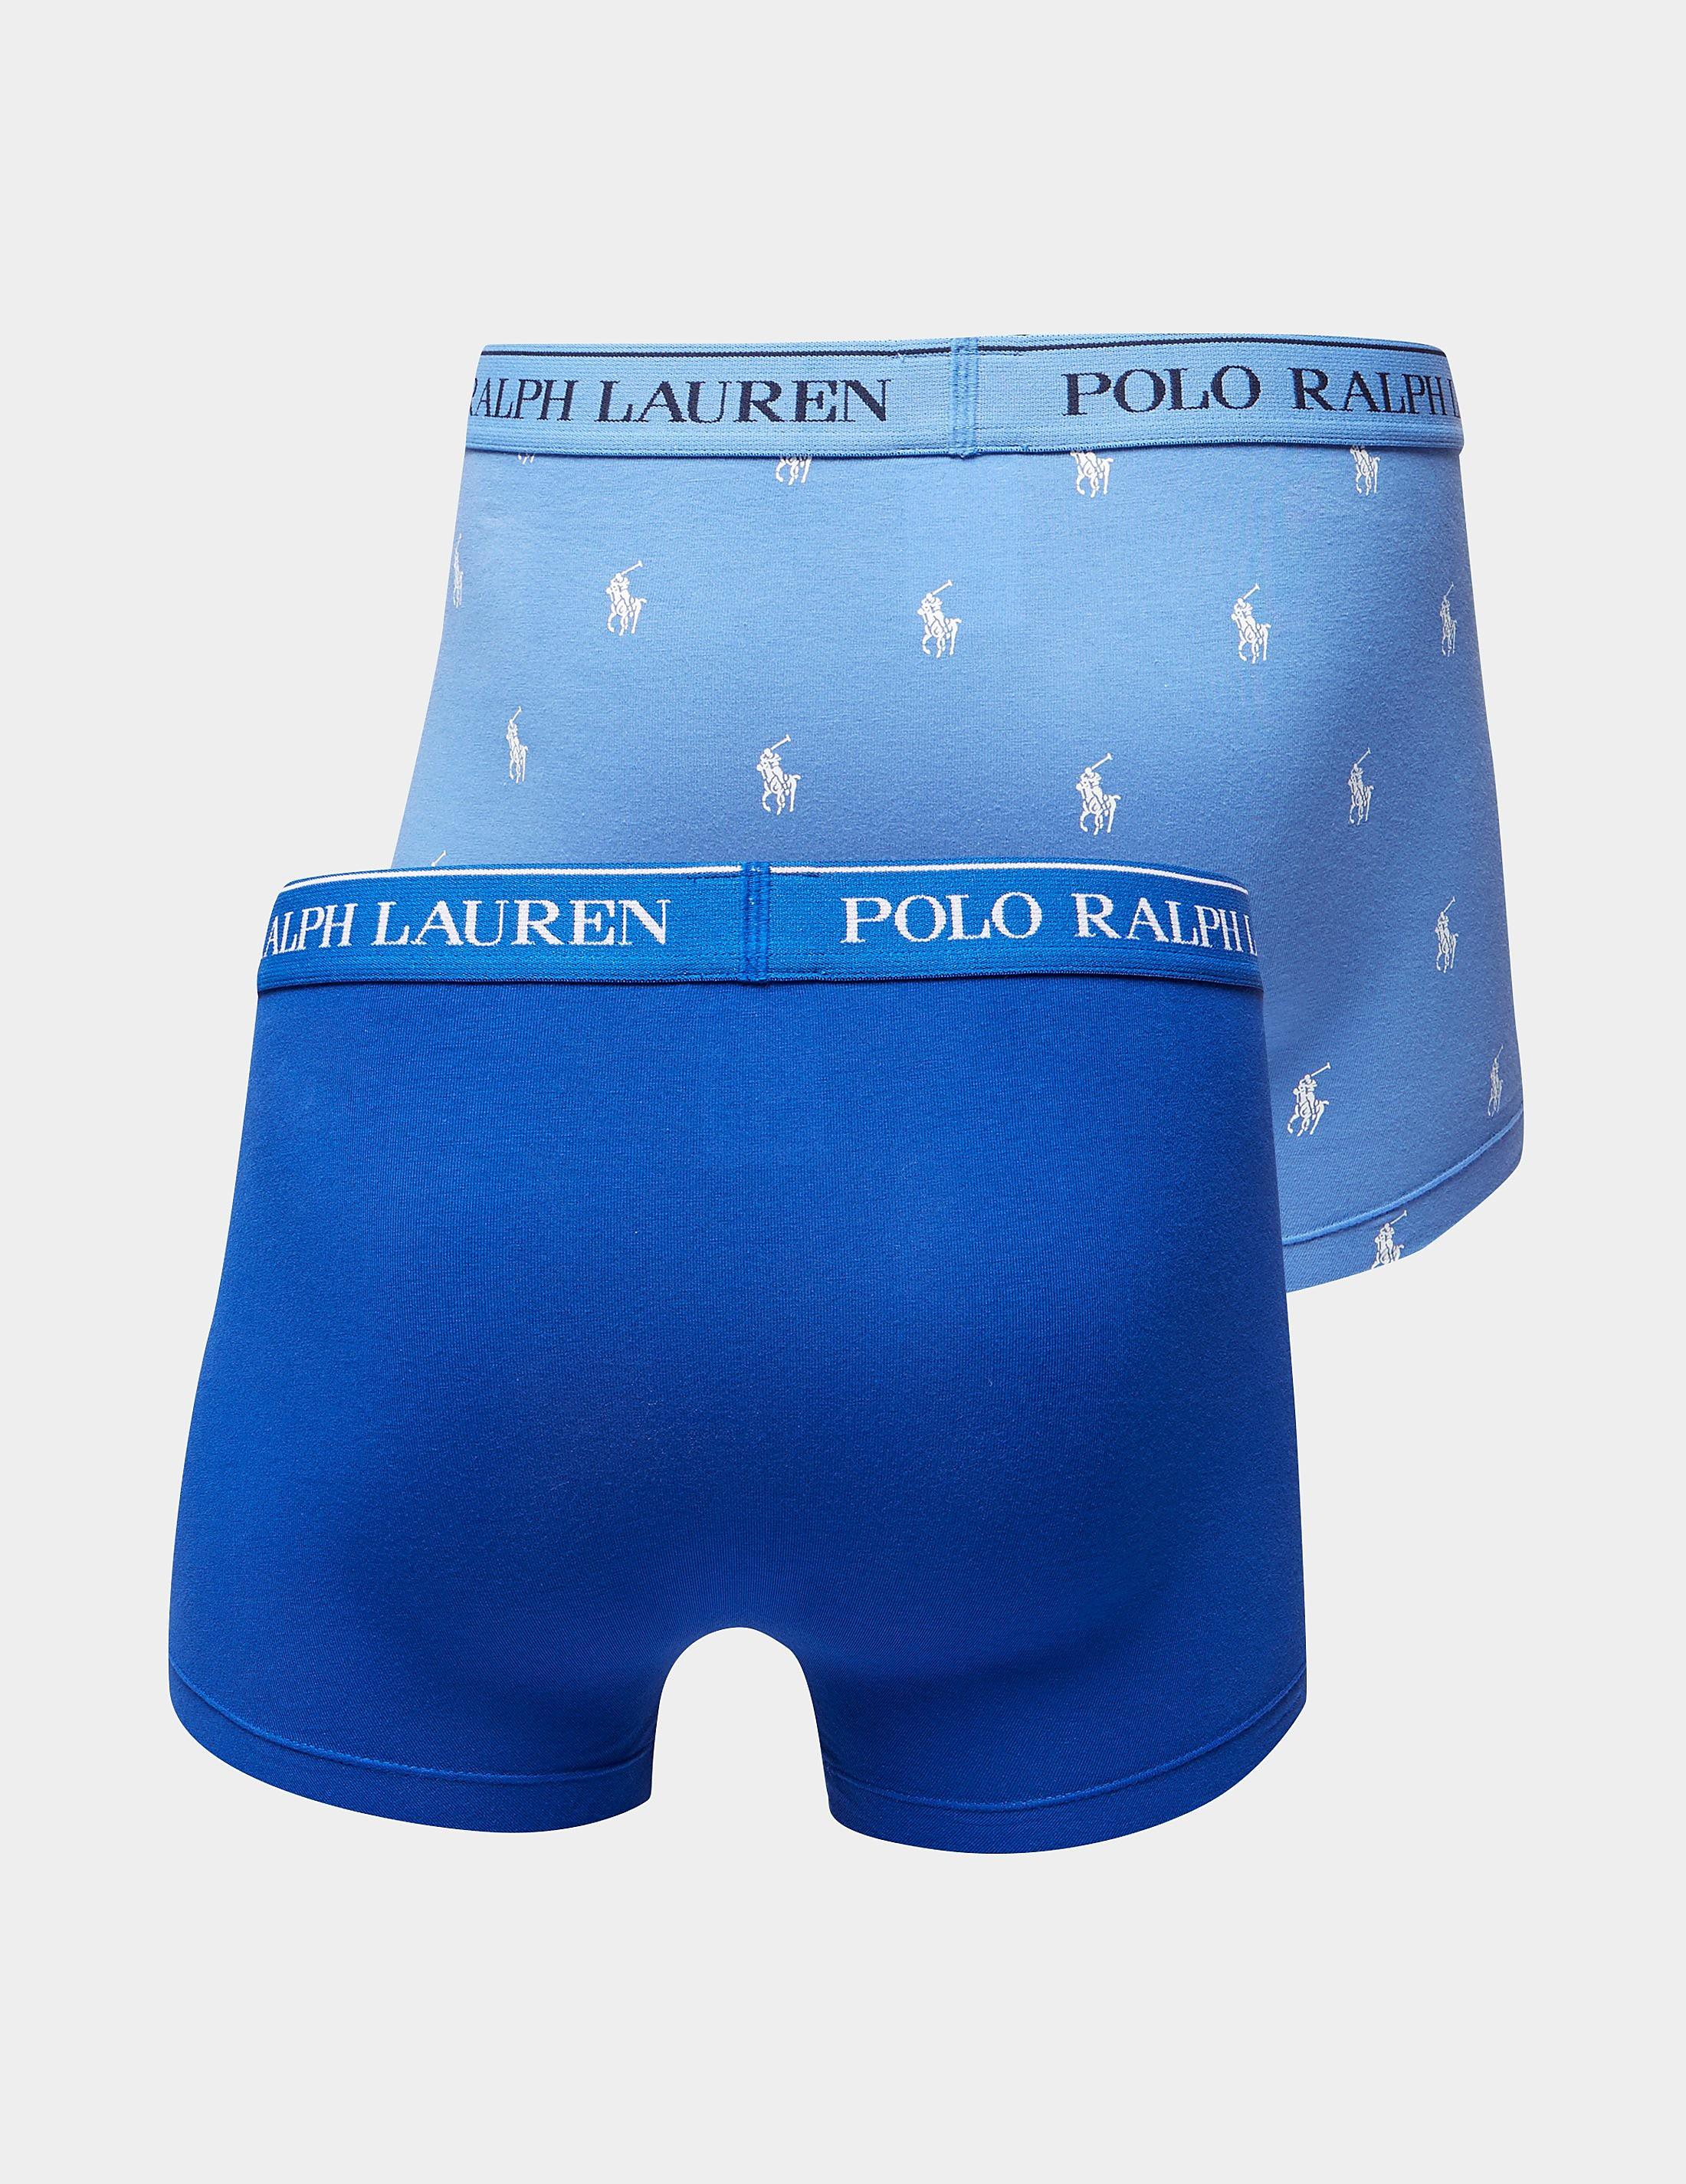 Polo Ralph Lauren 2-Pack Boxer Shorts